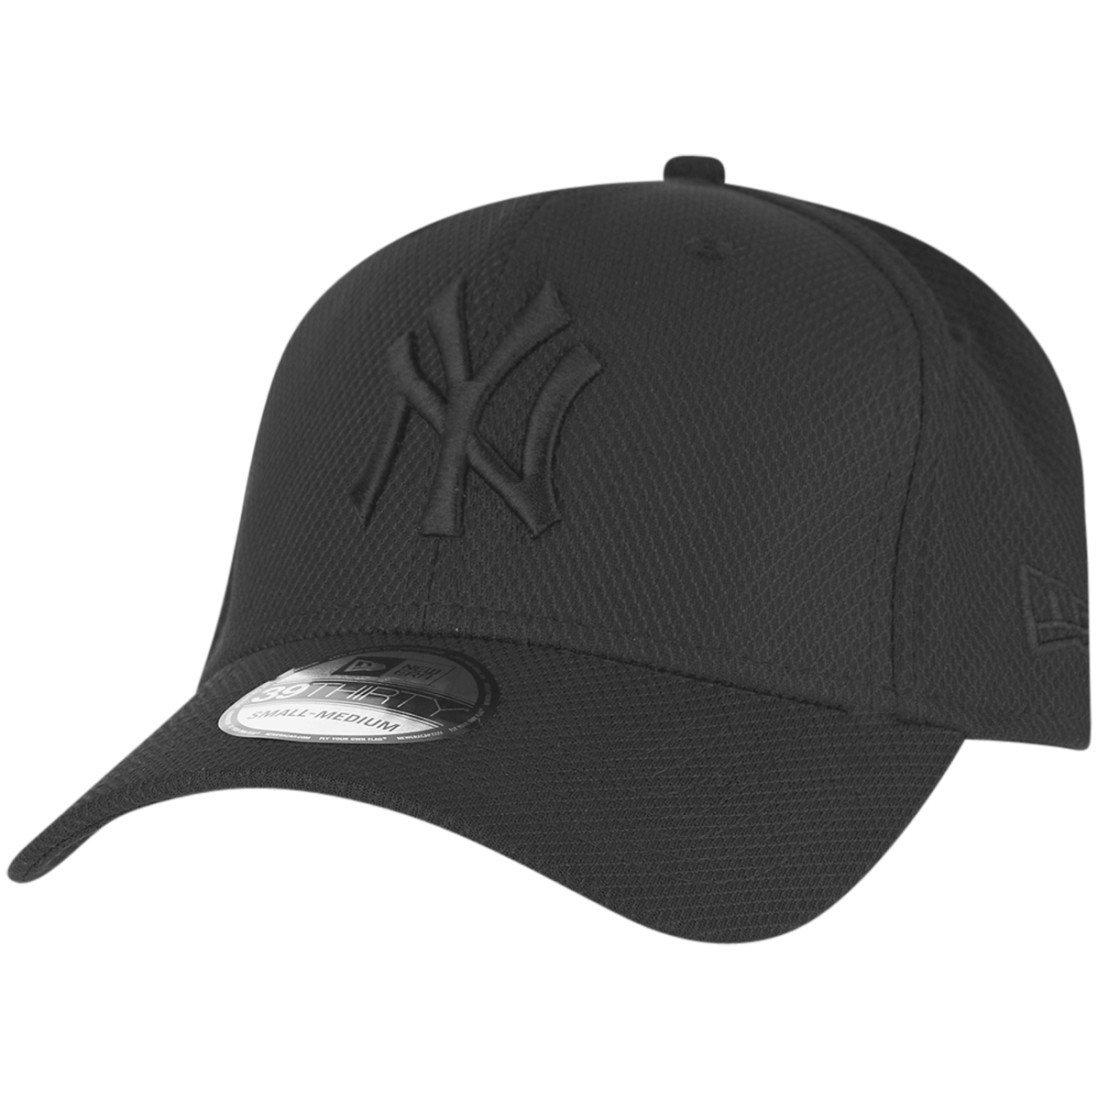 New Era Caps Diamond Era Ess New York Yankees Black